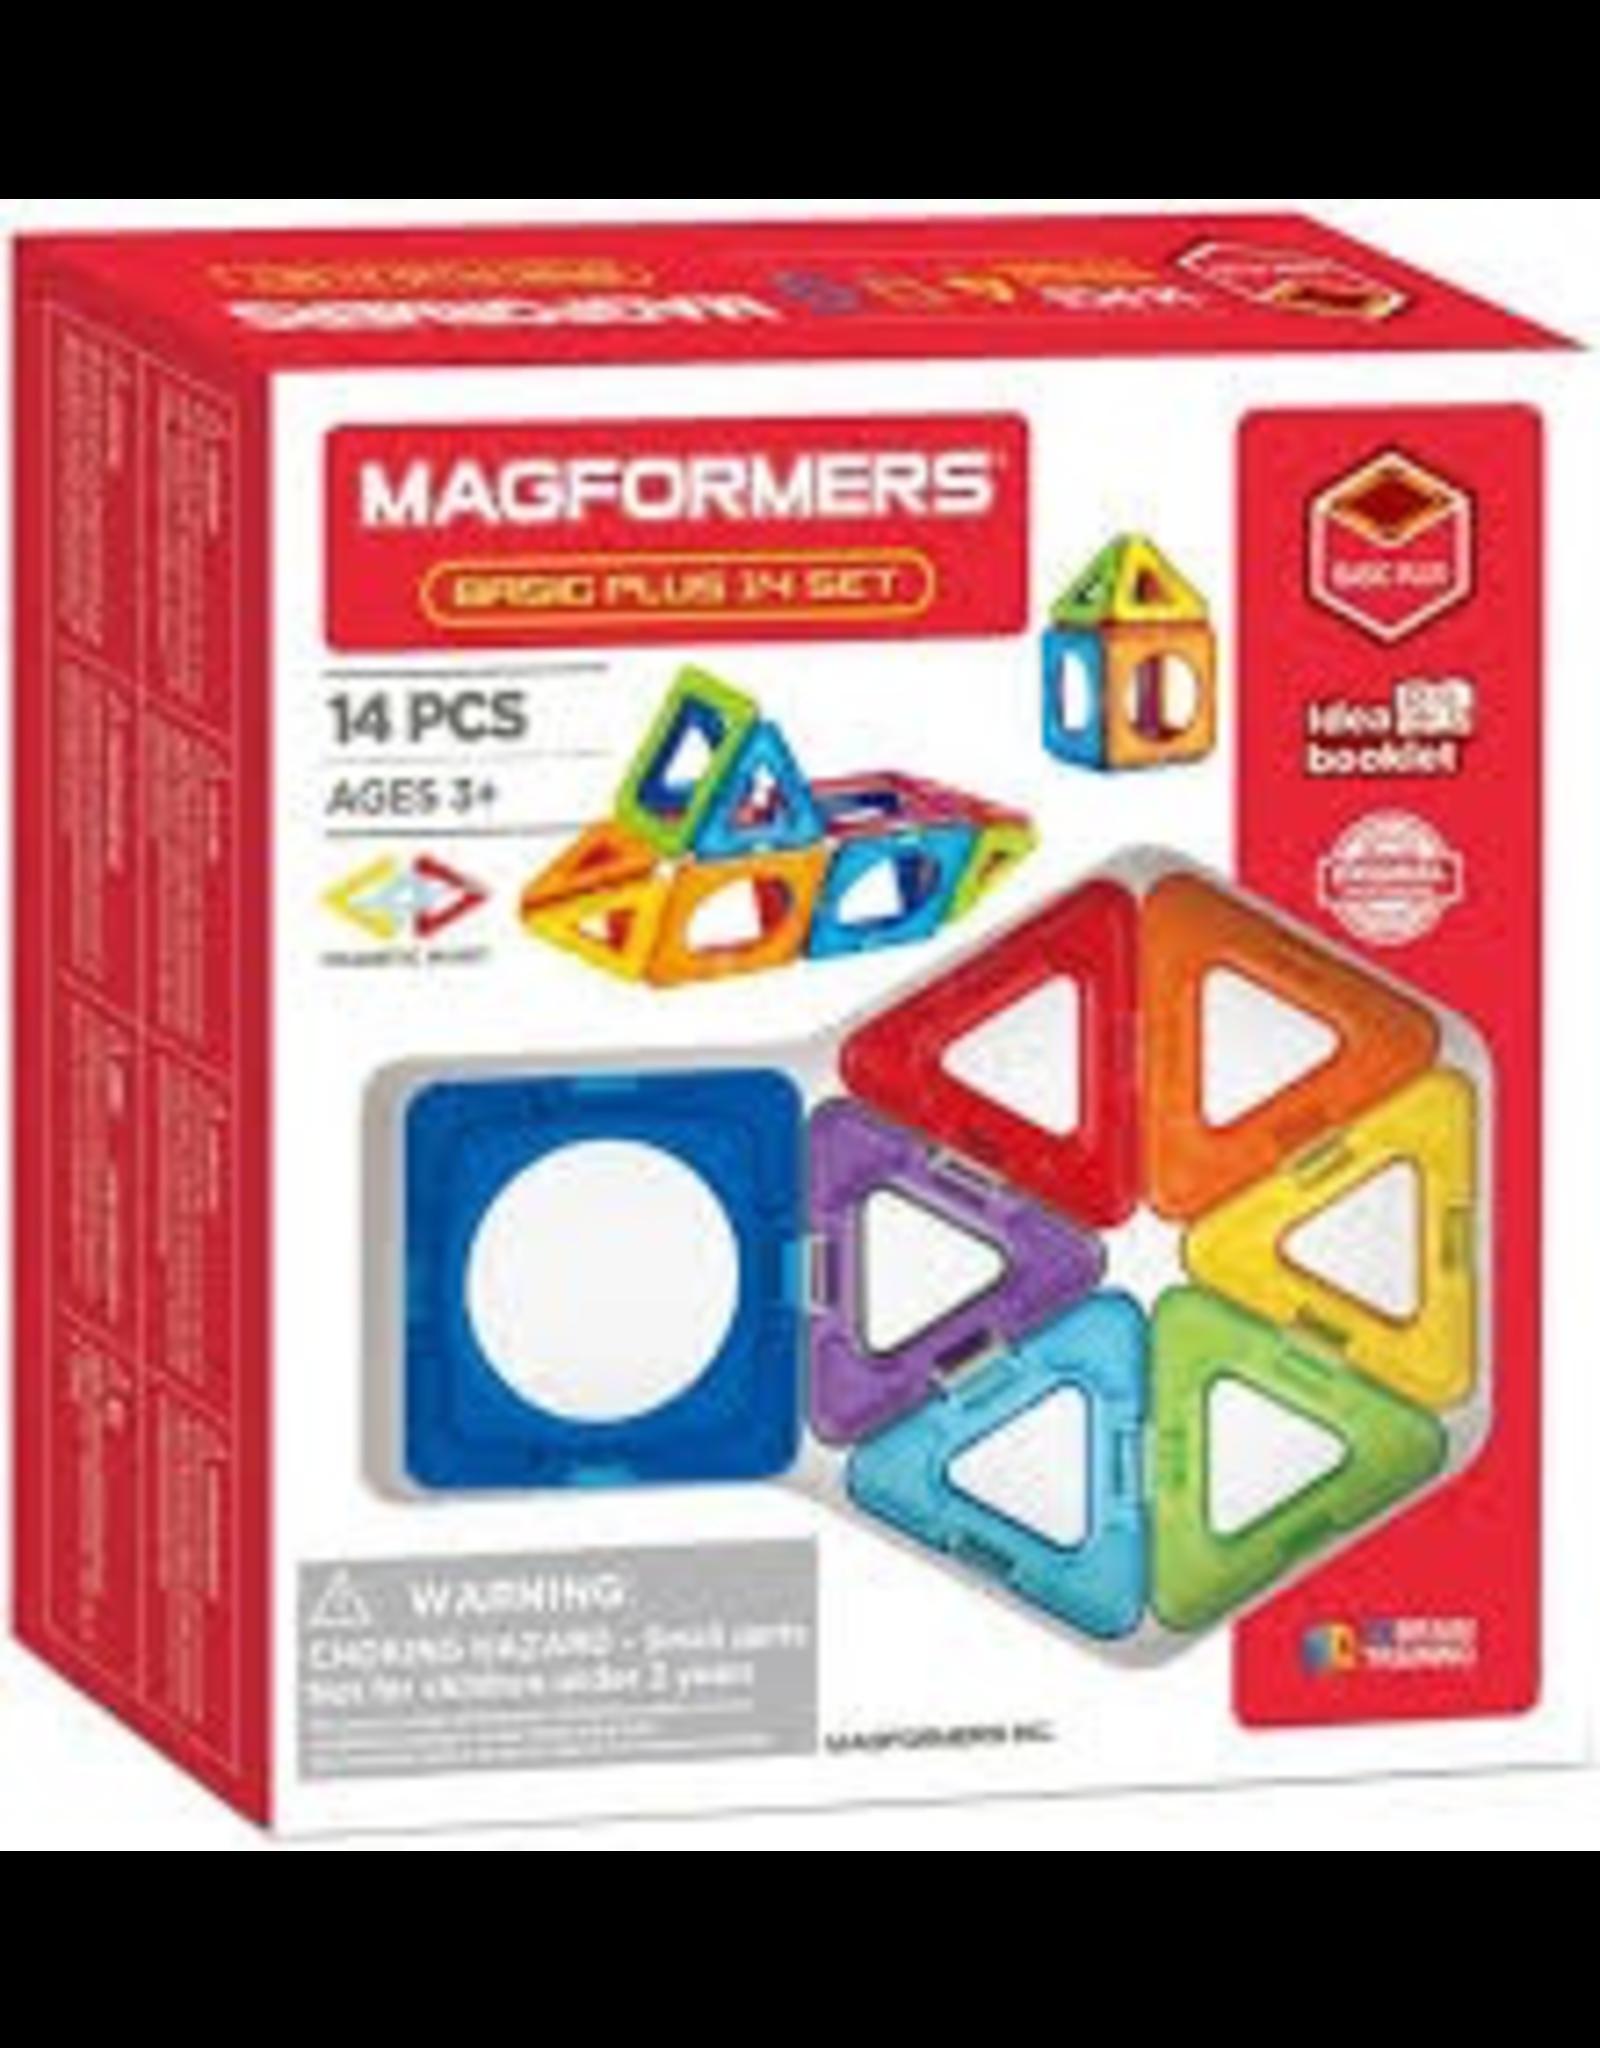 Magformers Magformers, Basic Plus, 14 pcs